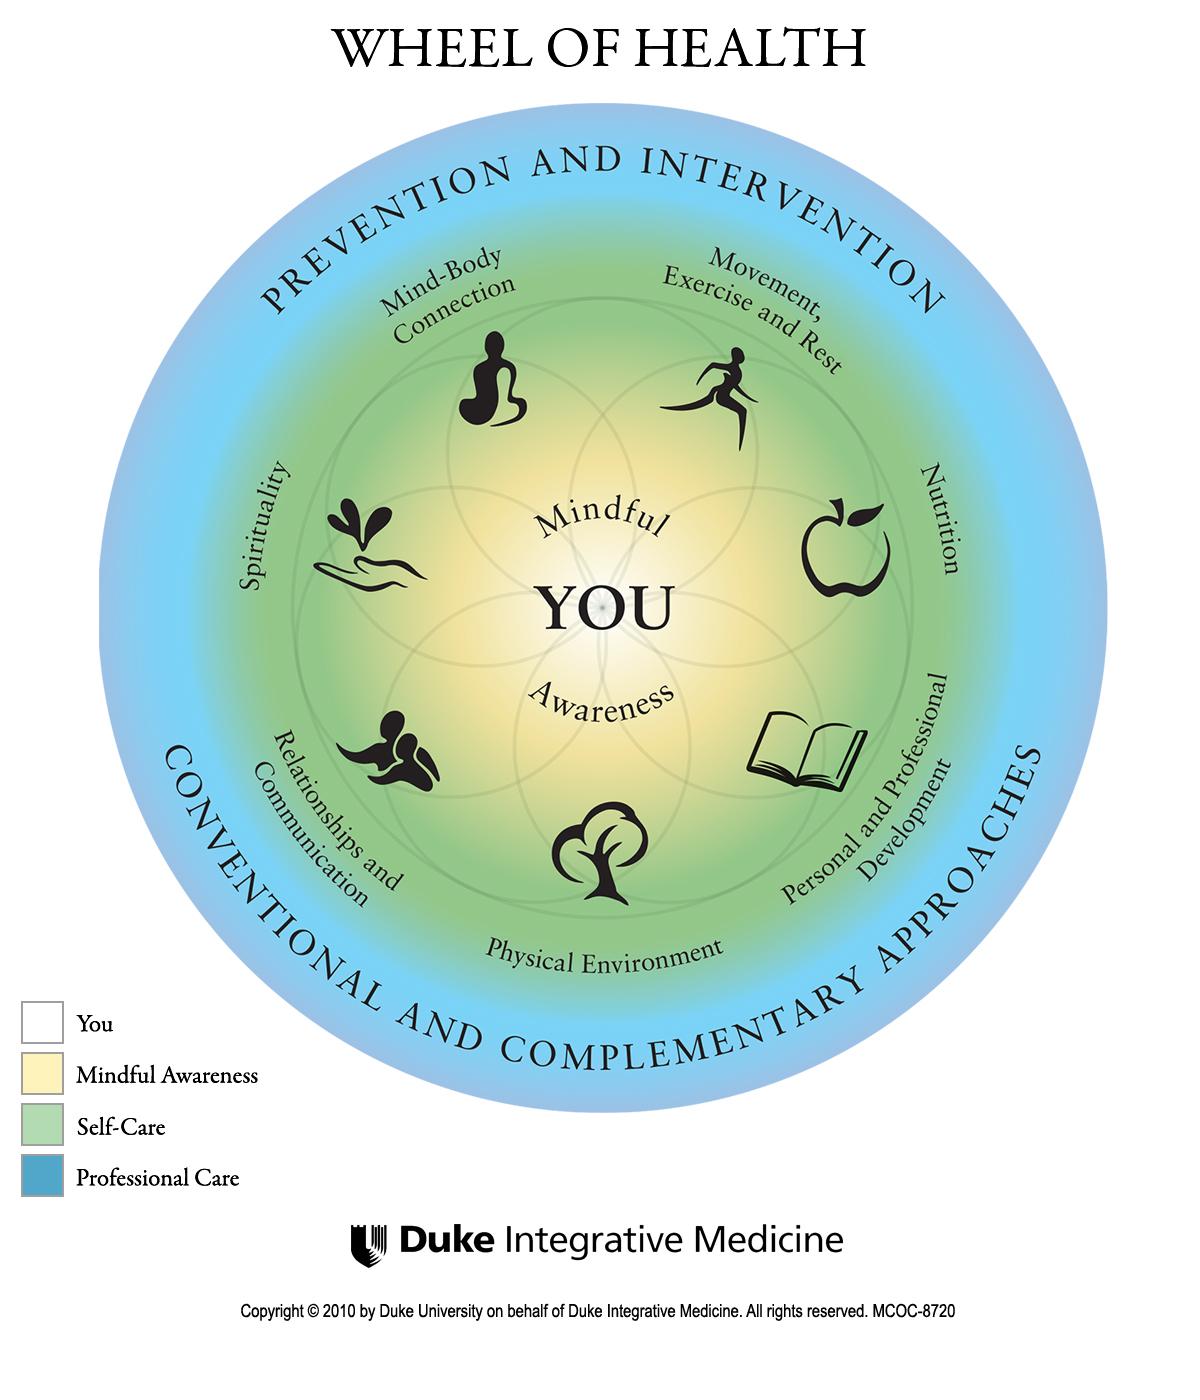 Duke Integrative Medicine Wheel of Health